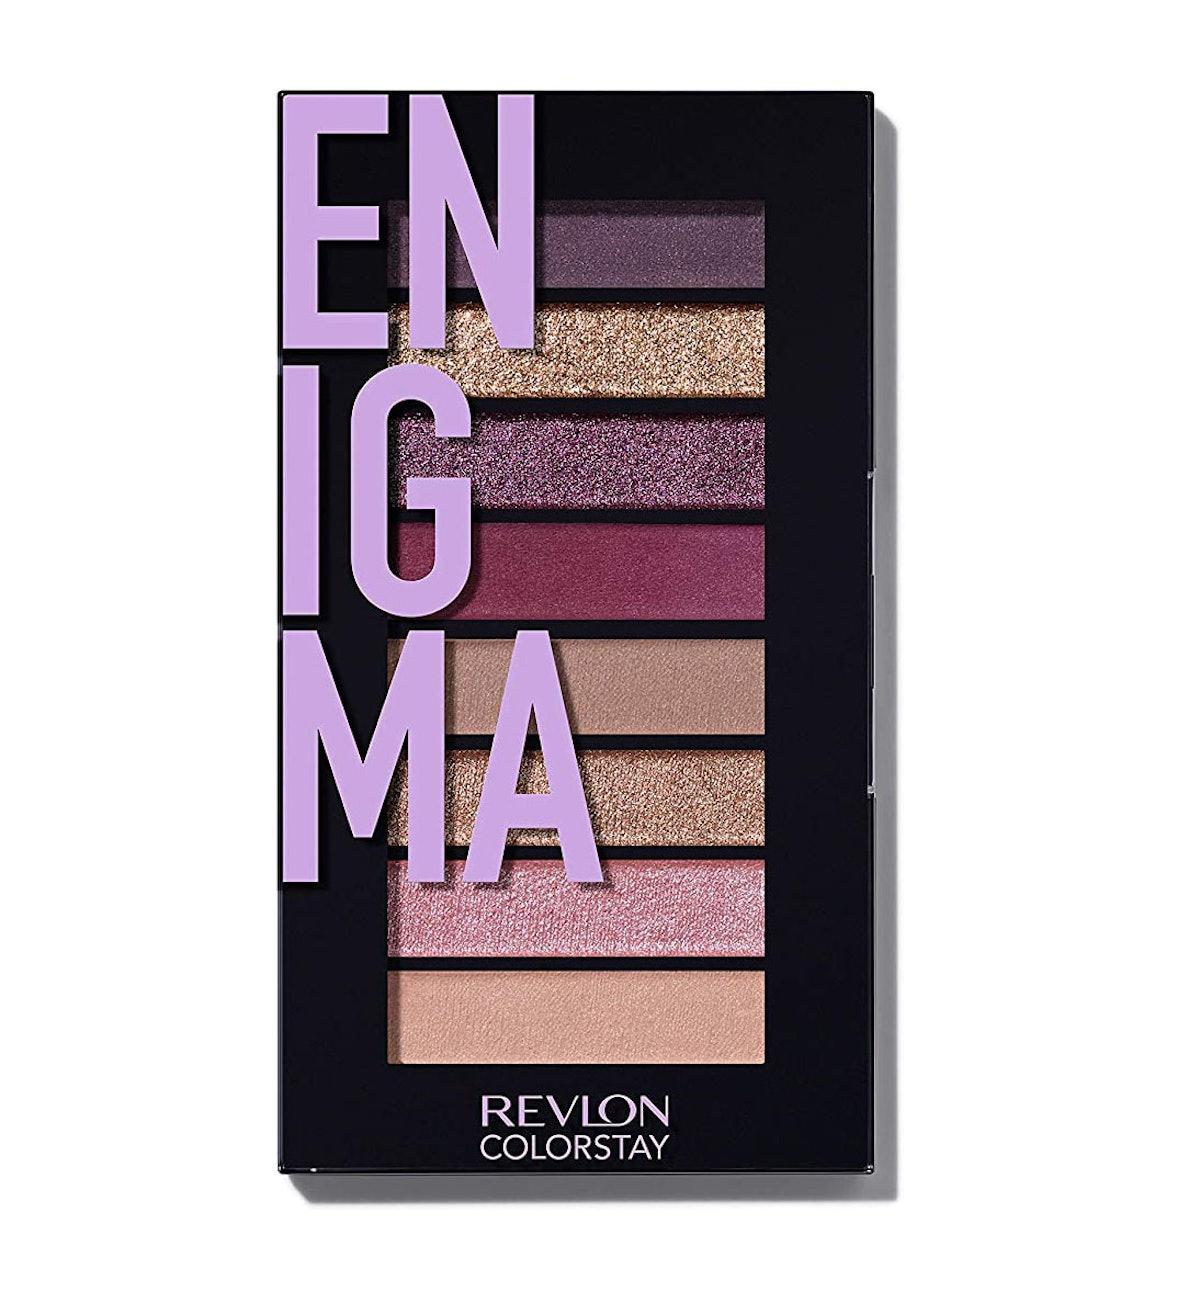 Revlon ColorStay Looks Book Eyeshadow Palette in Enigma